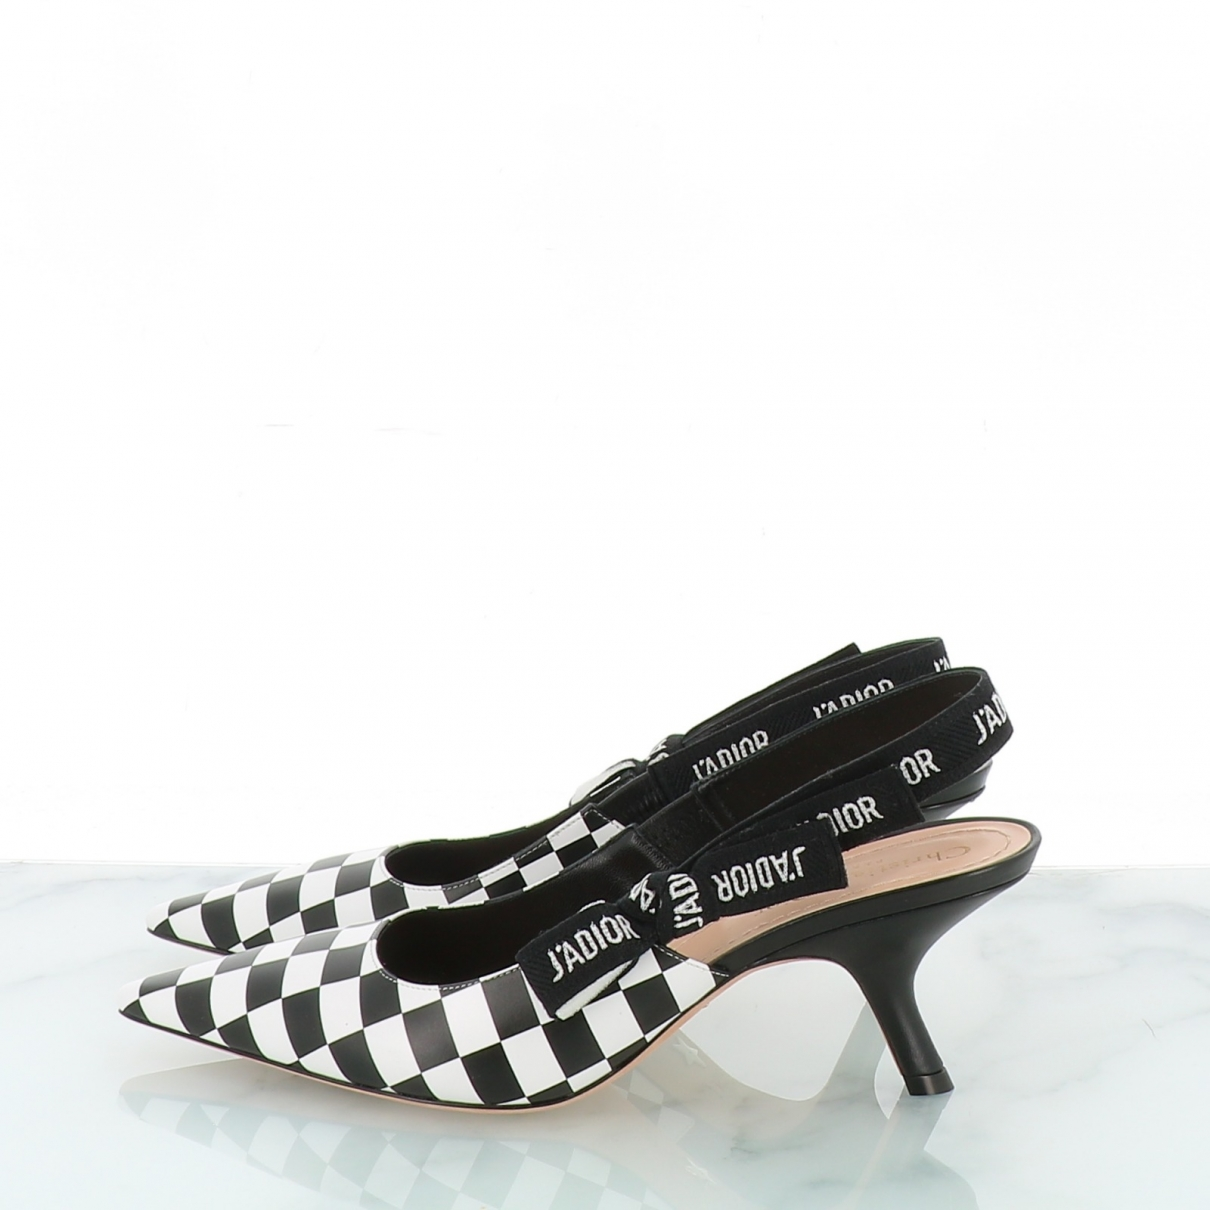 Dior - Escarpins J'adior pour femme en cuir - noir